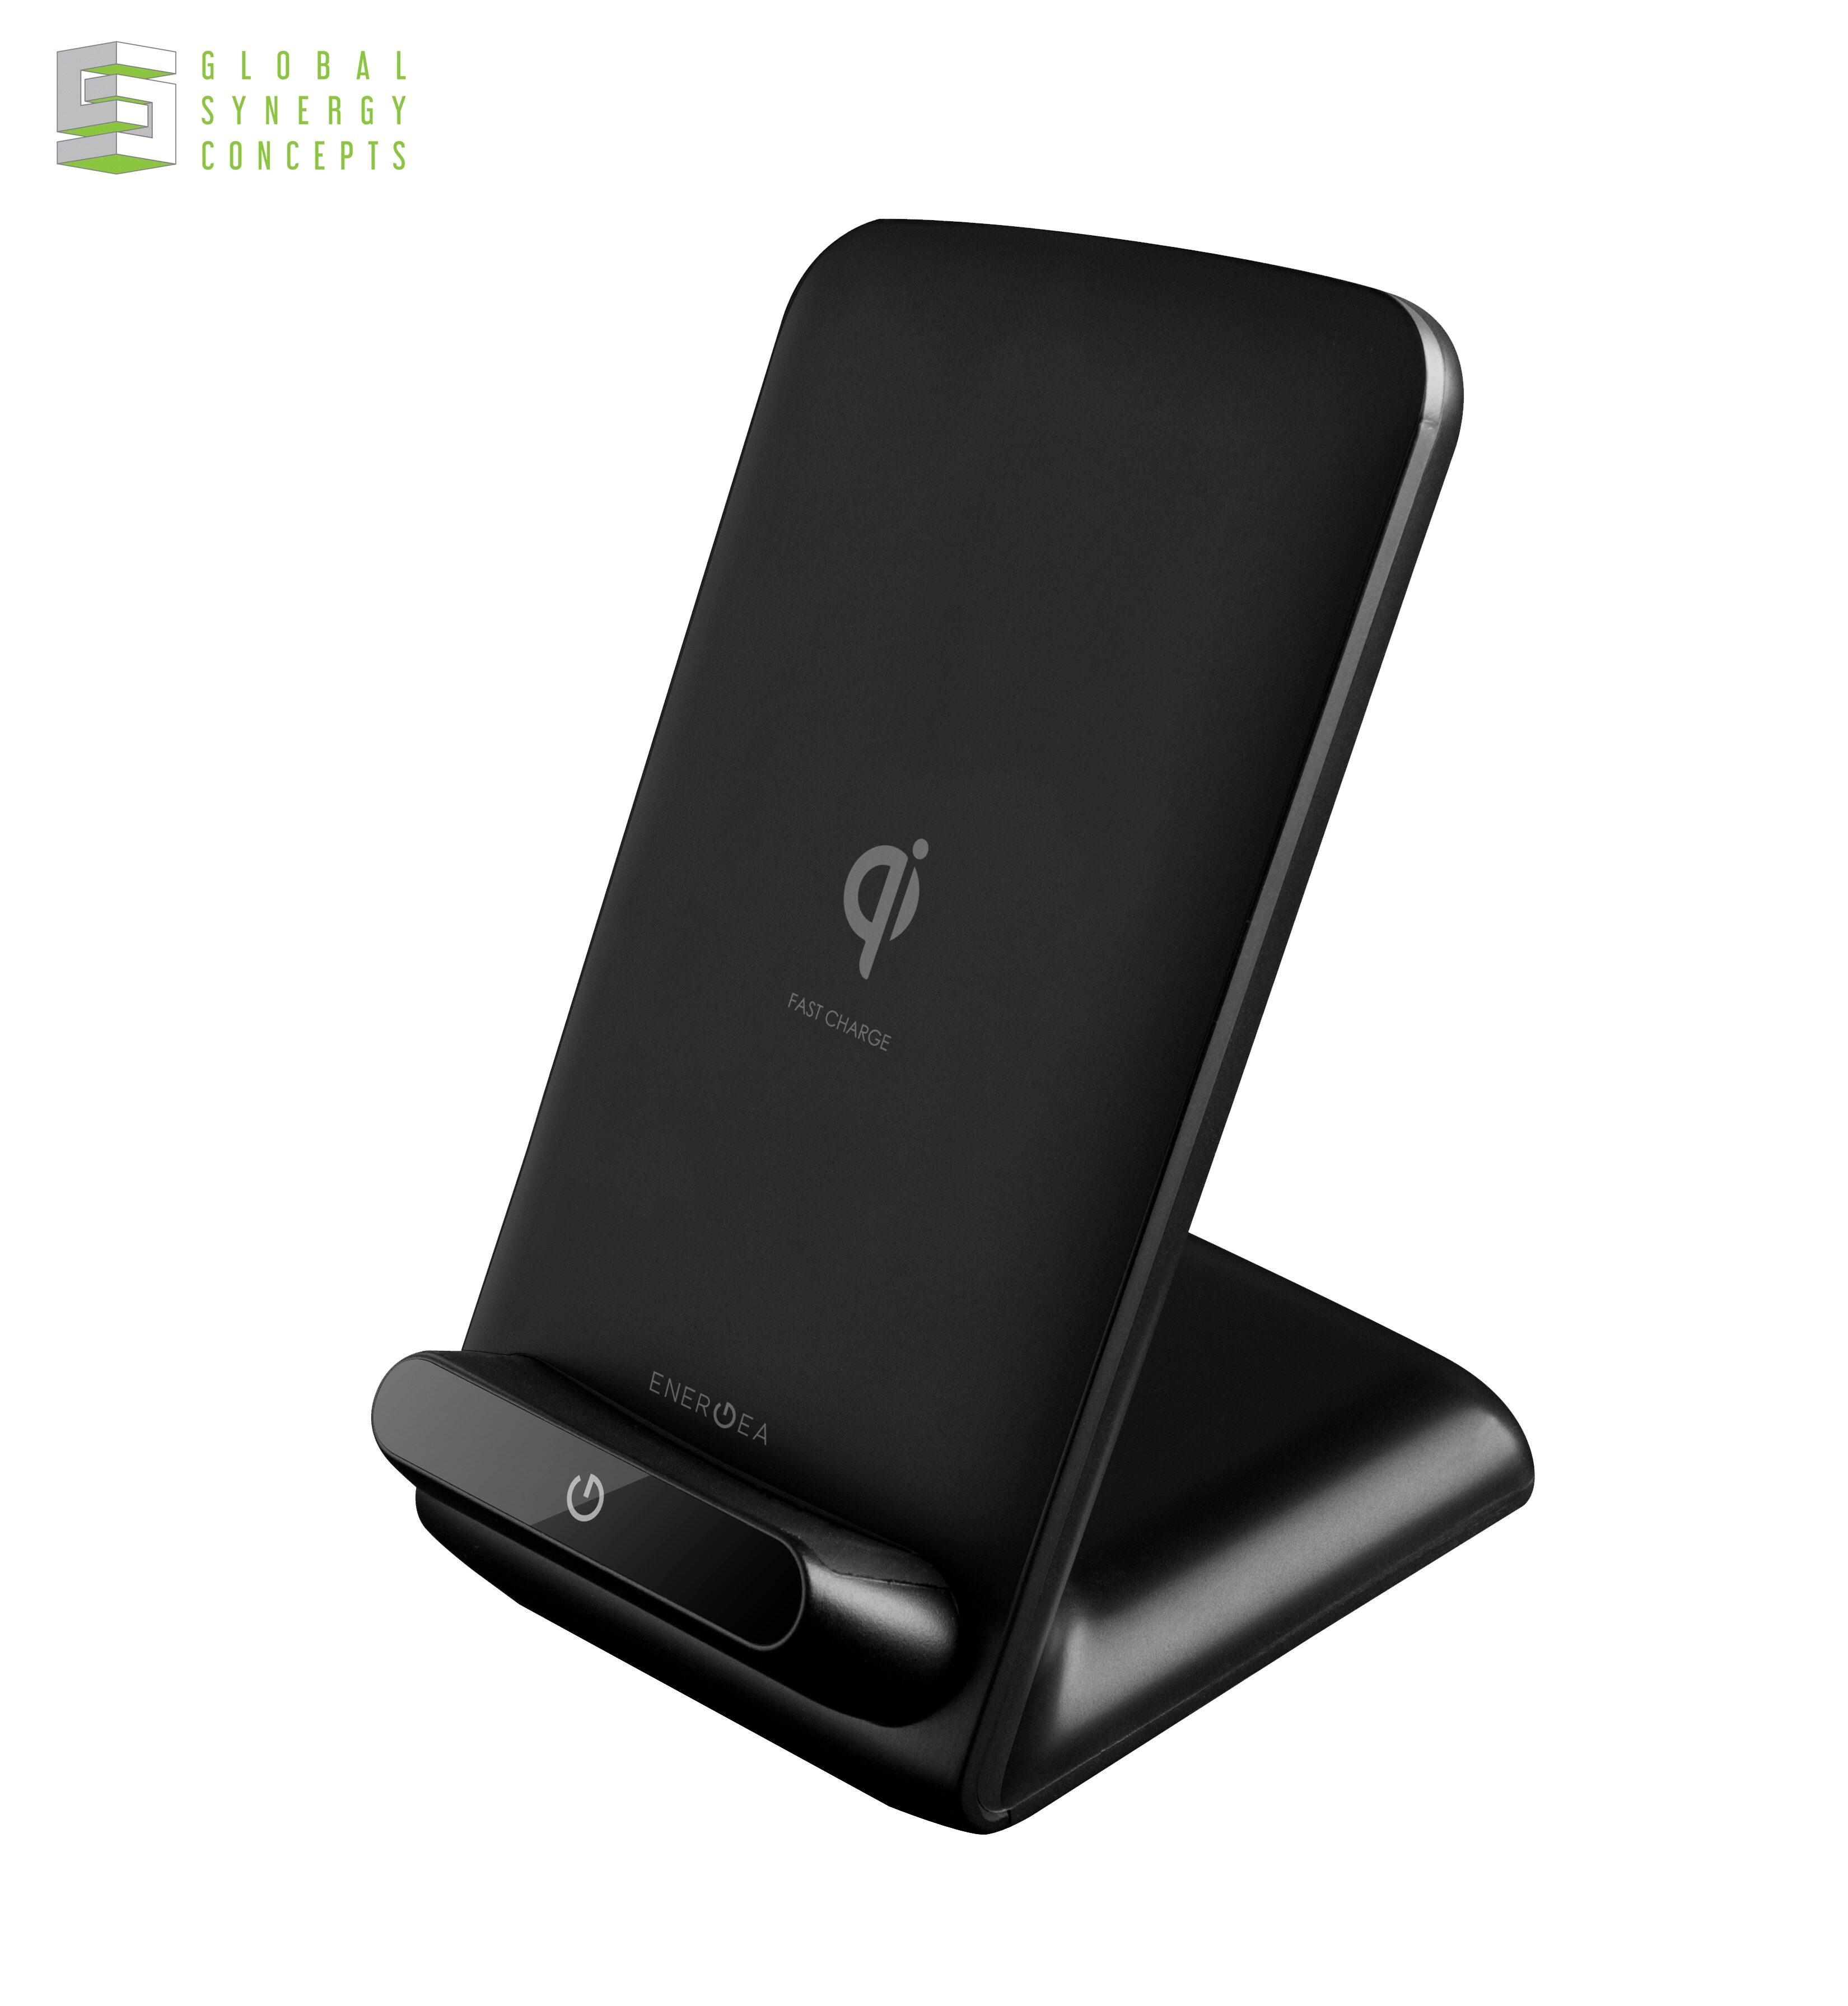 Energea WIDOCK 2-Coils Wireless Fast Charging Stand